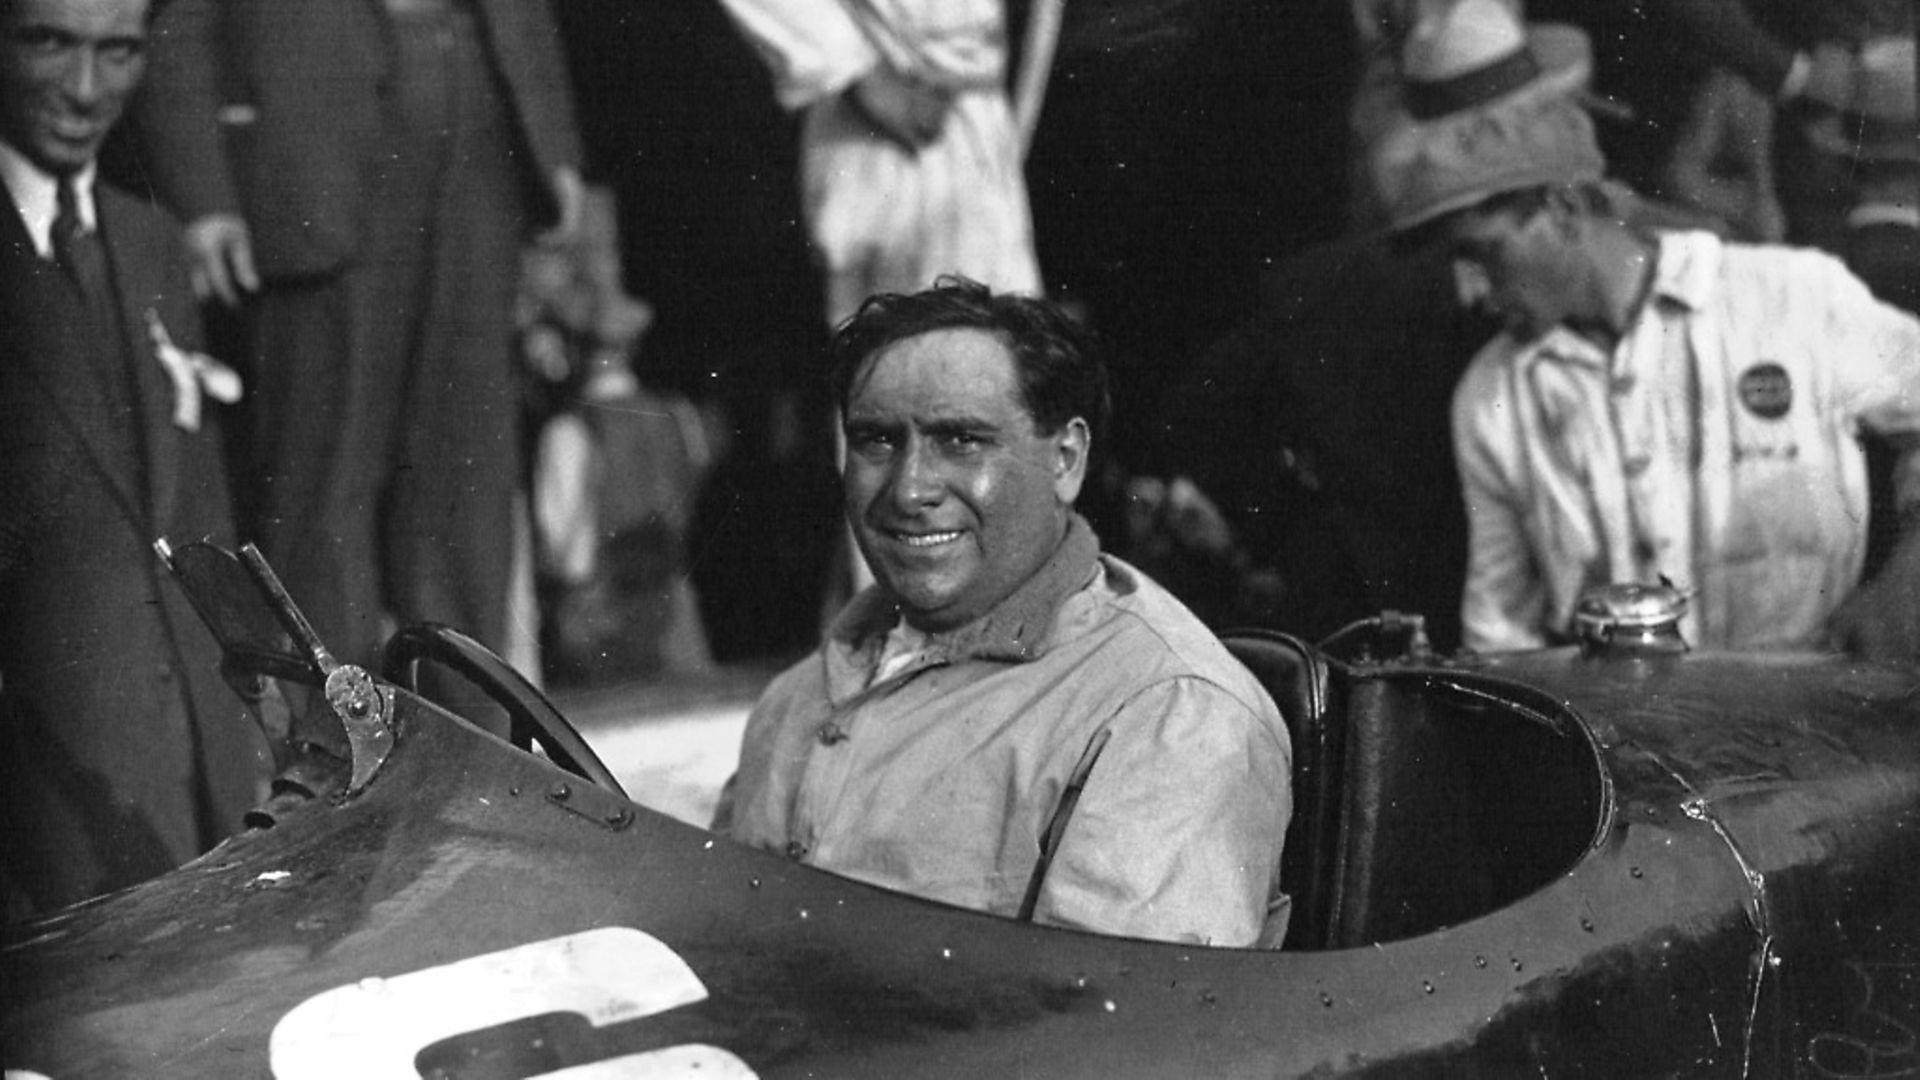 Giusepp Camari, June 8, 1892 - September 10, 1933, was a world famous opera singer and racing driver. - Credit: Archant